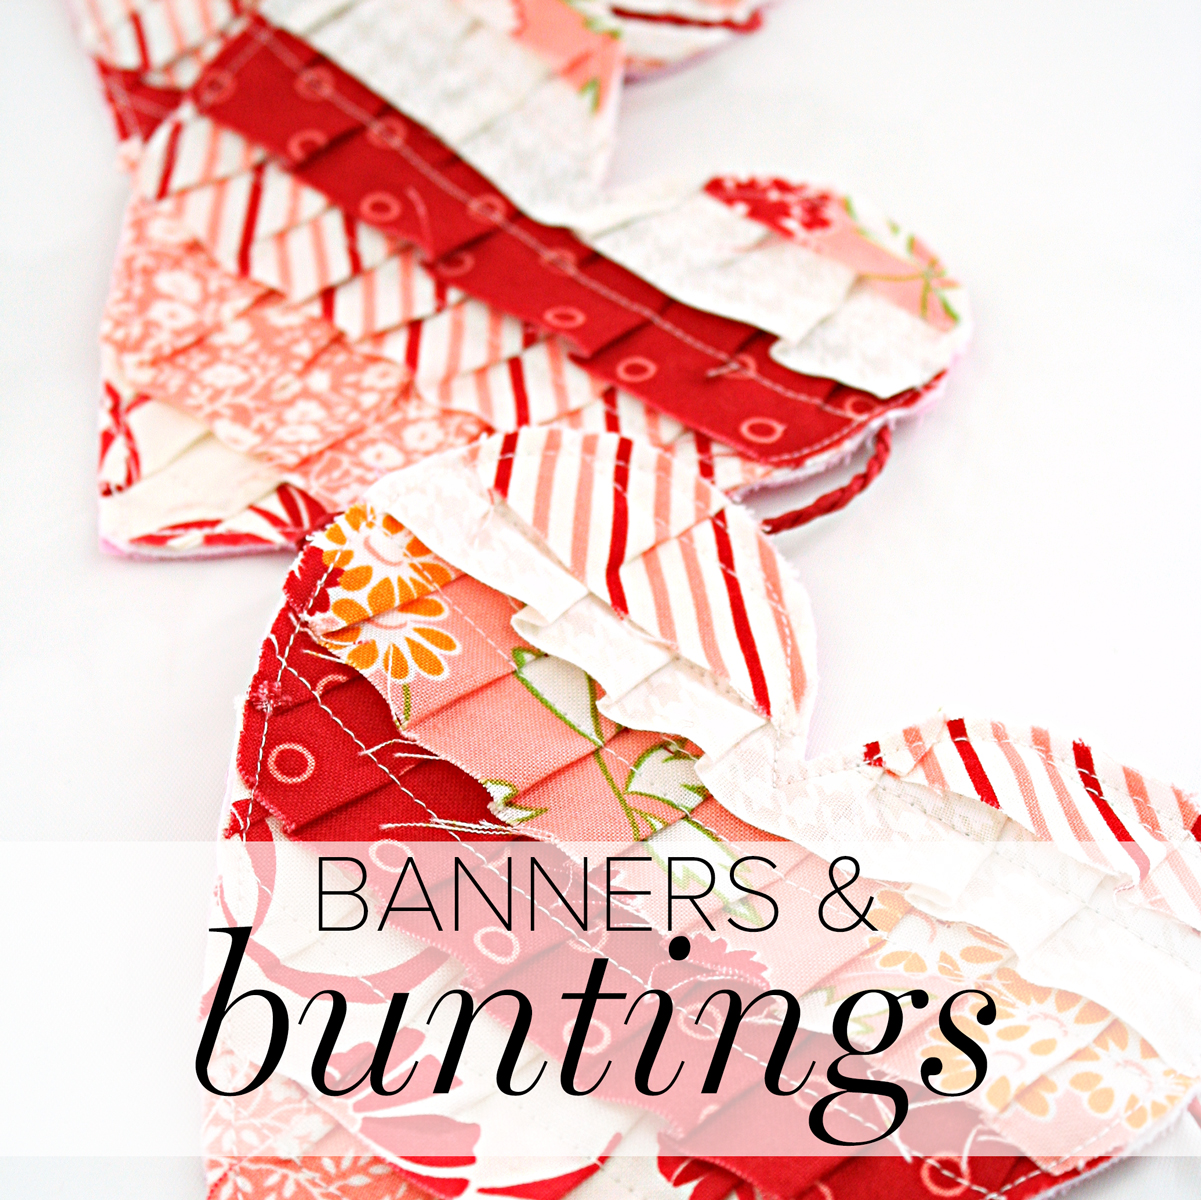 Banners & Buntings